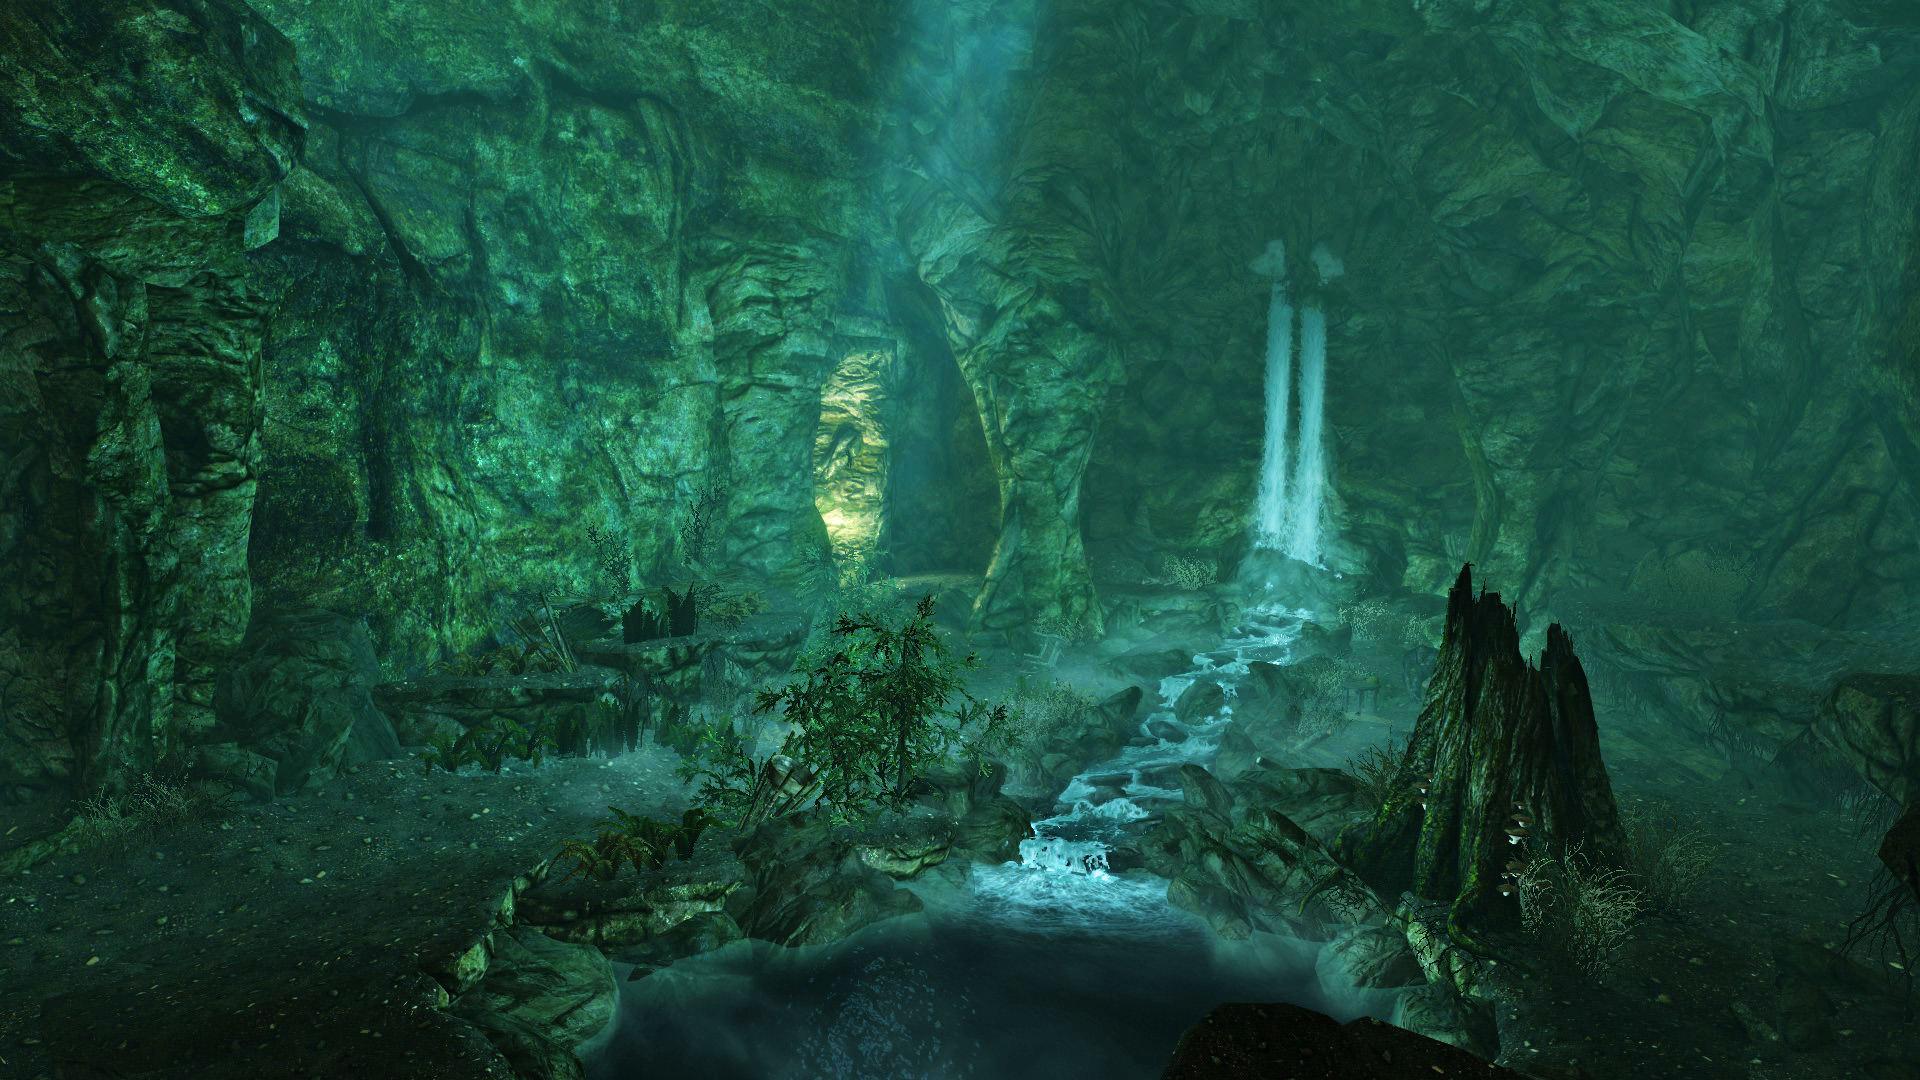 [Mission libre C] Une si calme patrouille [PV Chikara Meiyo] 1541868956-waterfall-inside-darkshade-copse